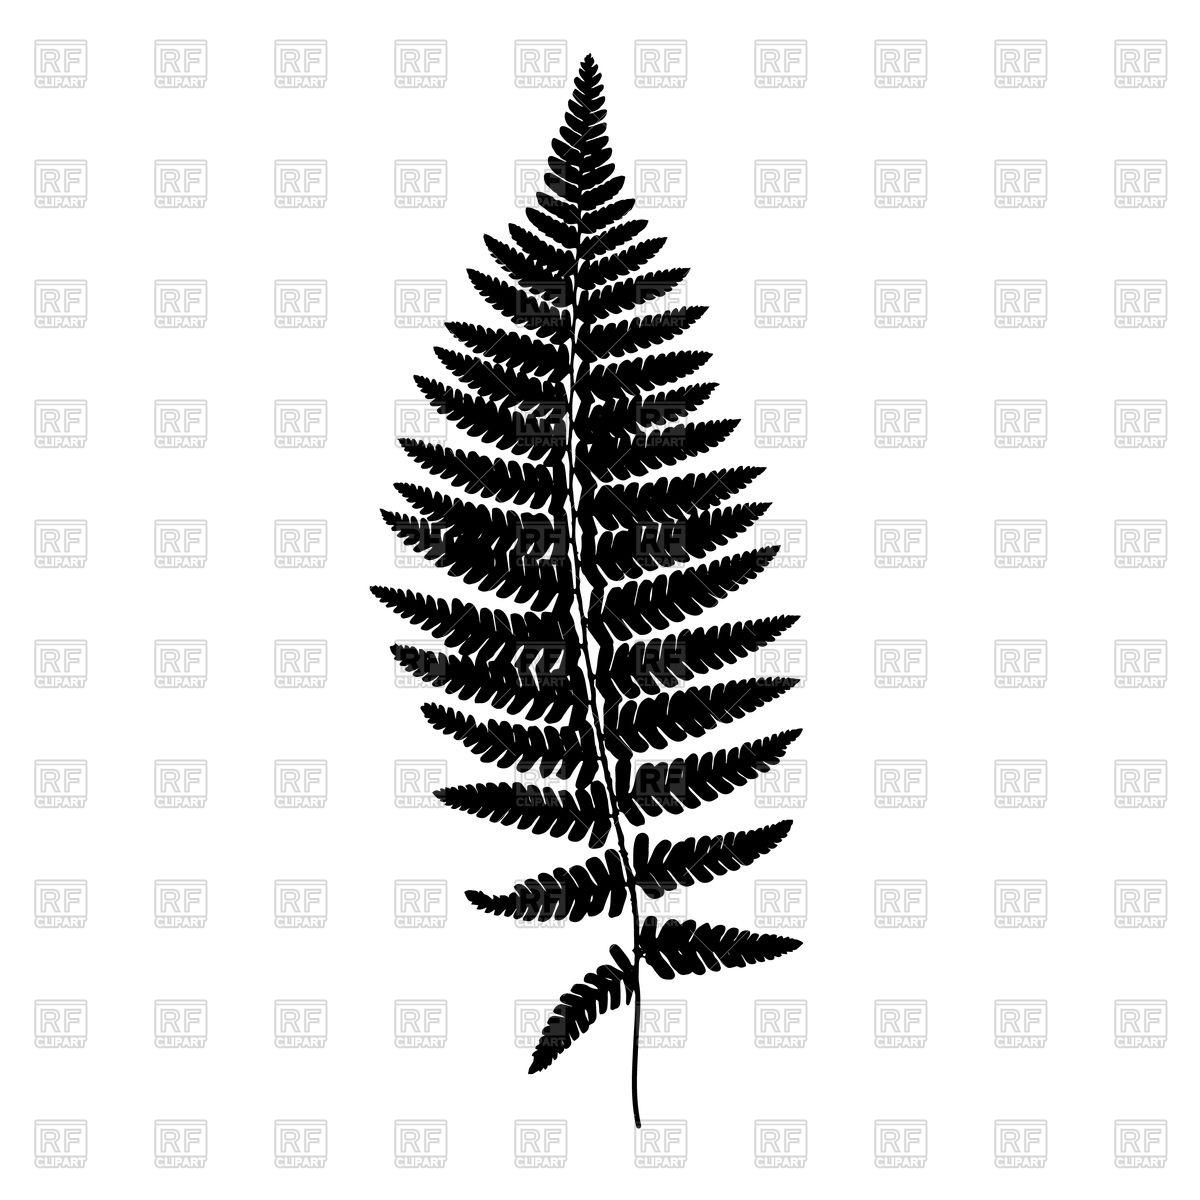 Fern leaf black silhouette Vector Image #96977.